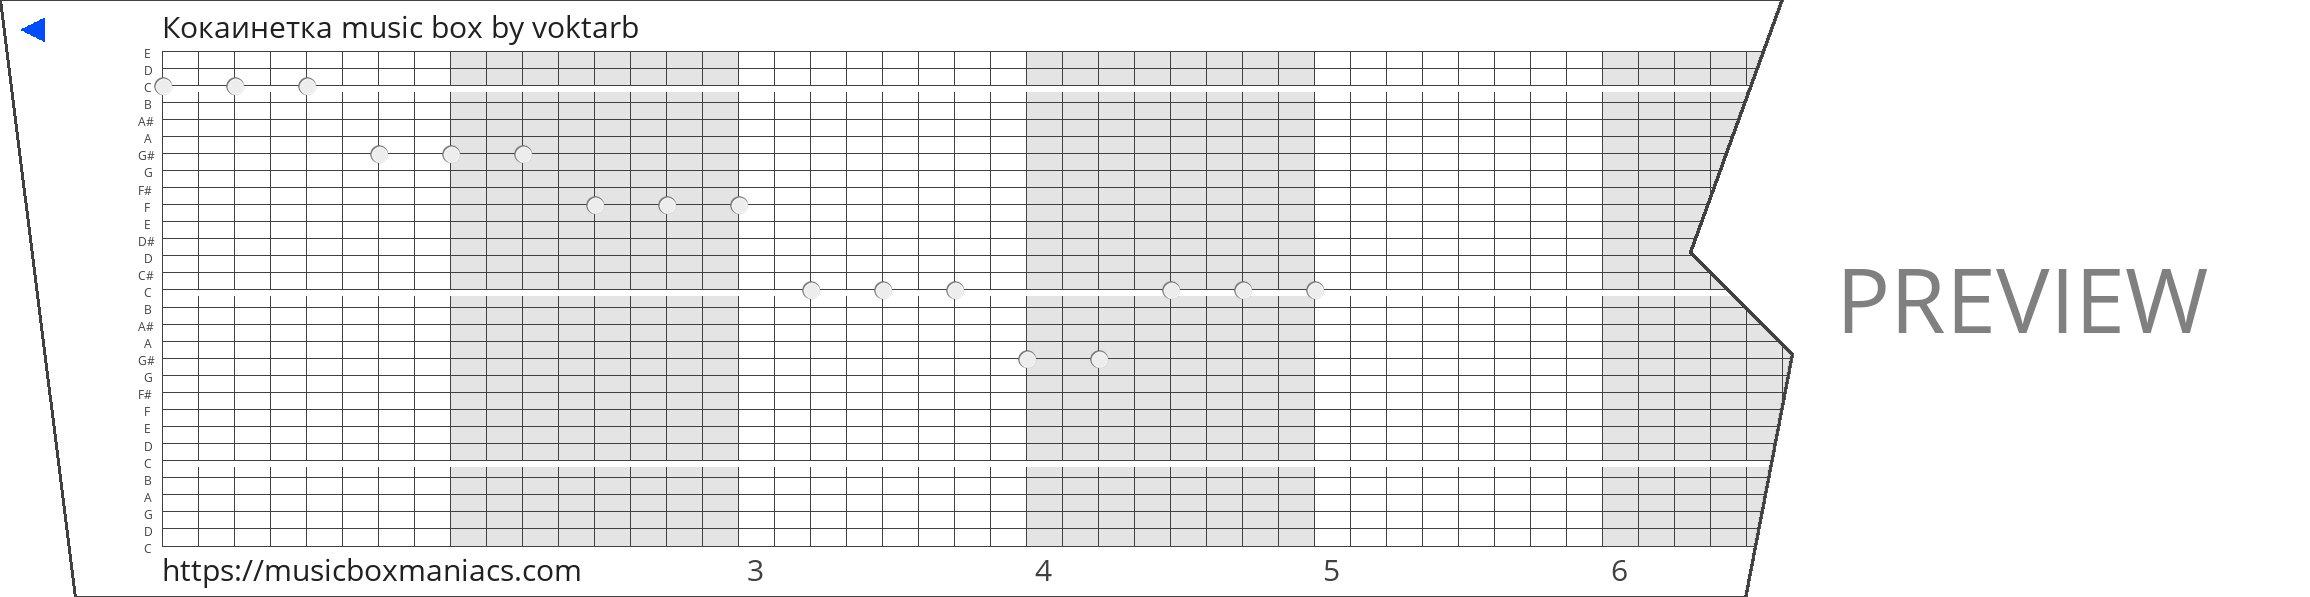 Кокаинетка music box 30 note music box paper strip